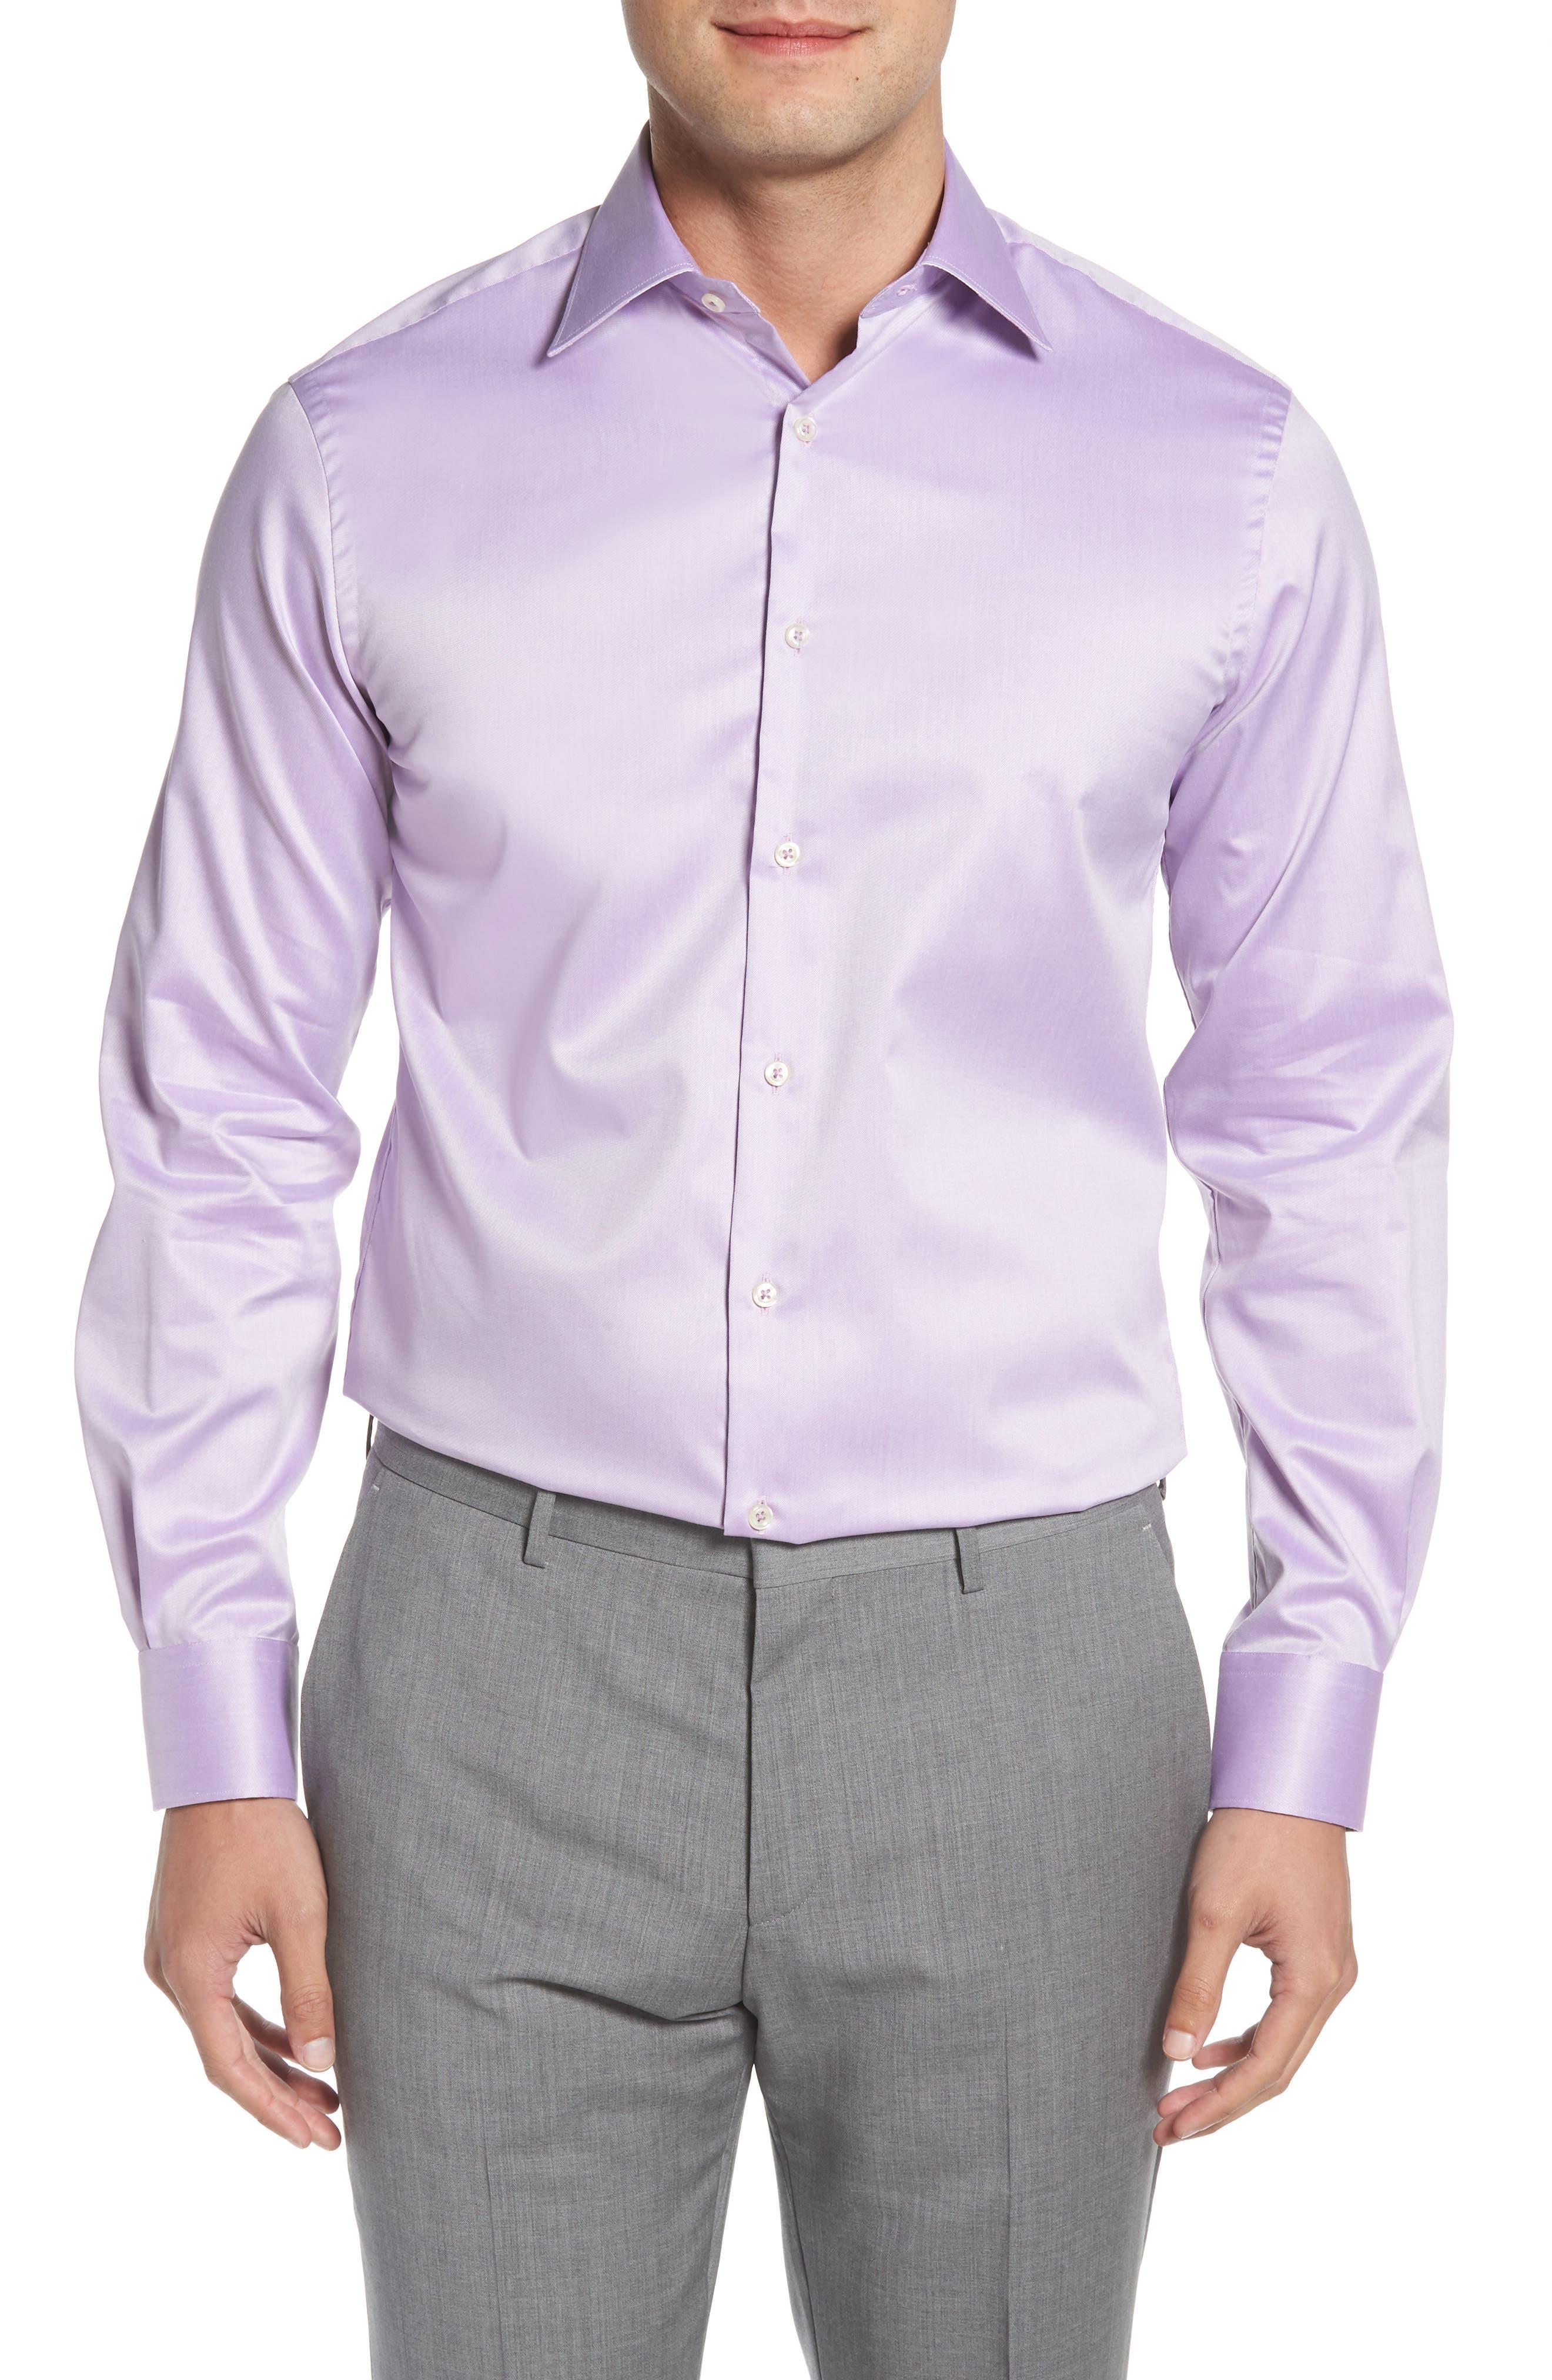 Regular Fit Solid Dress Shirt,                             Main thumbnail 1, color,                             PURPLE